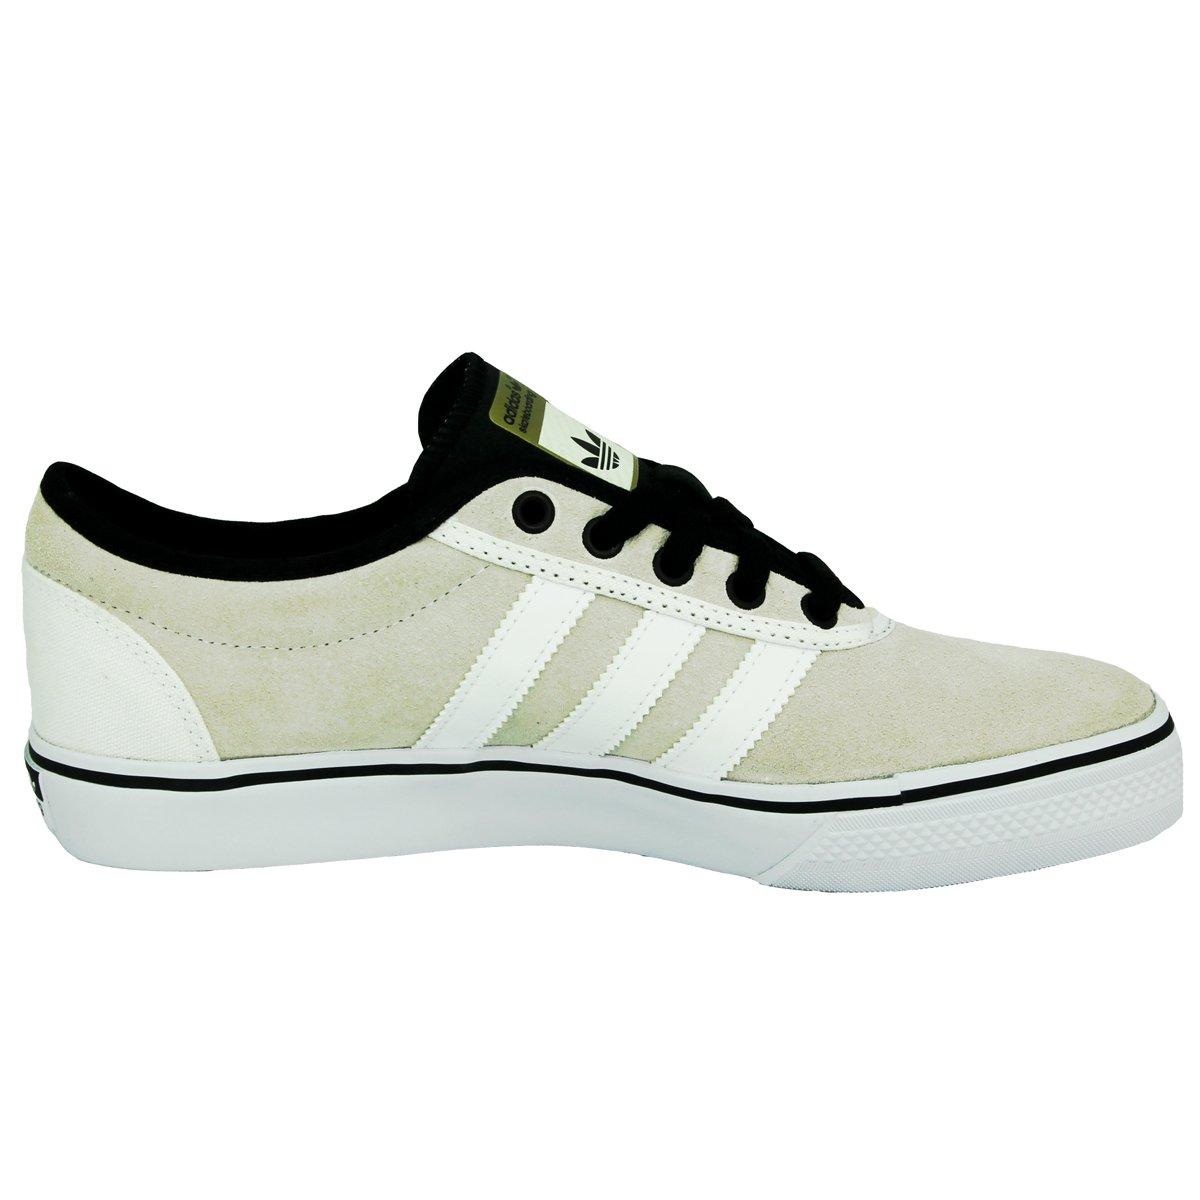 competitive price 01f99 bd982 adidas Originals ADI EASE 2 Zapatillas Sneakers Cuero Gamuza Beige para  Hombre QrXpLfc4O